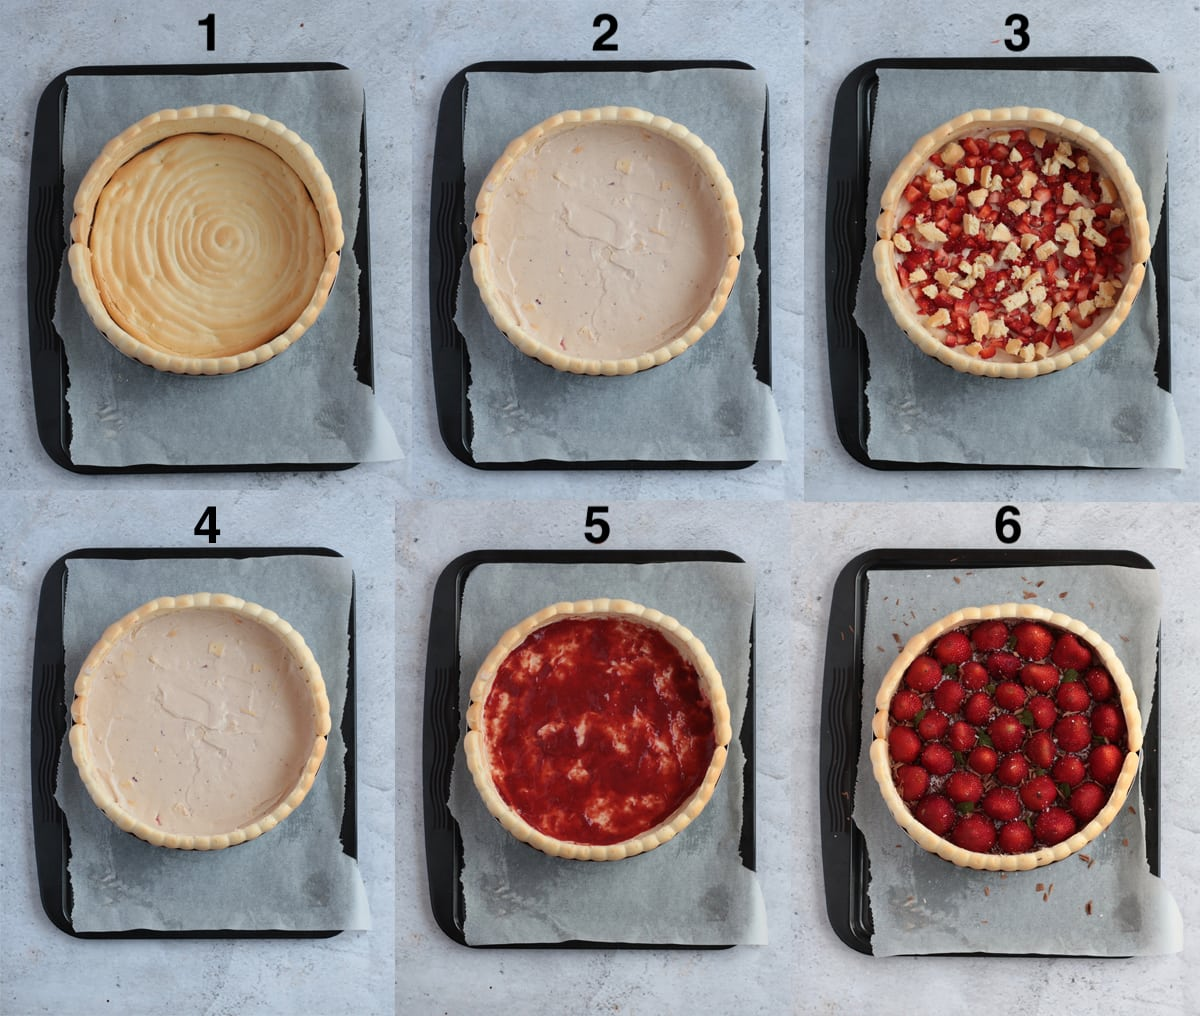 Process Shots of Assembling the Strawberry Cake